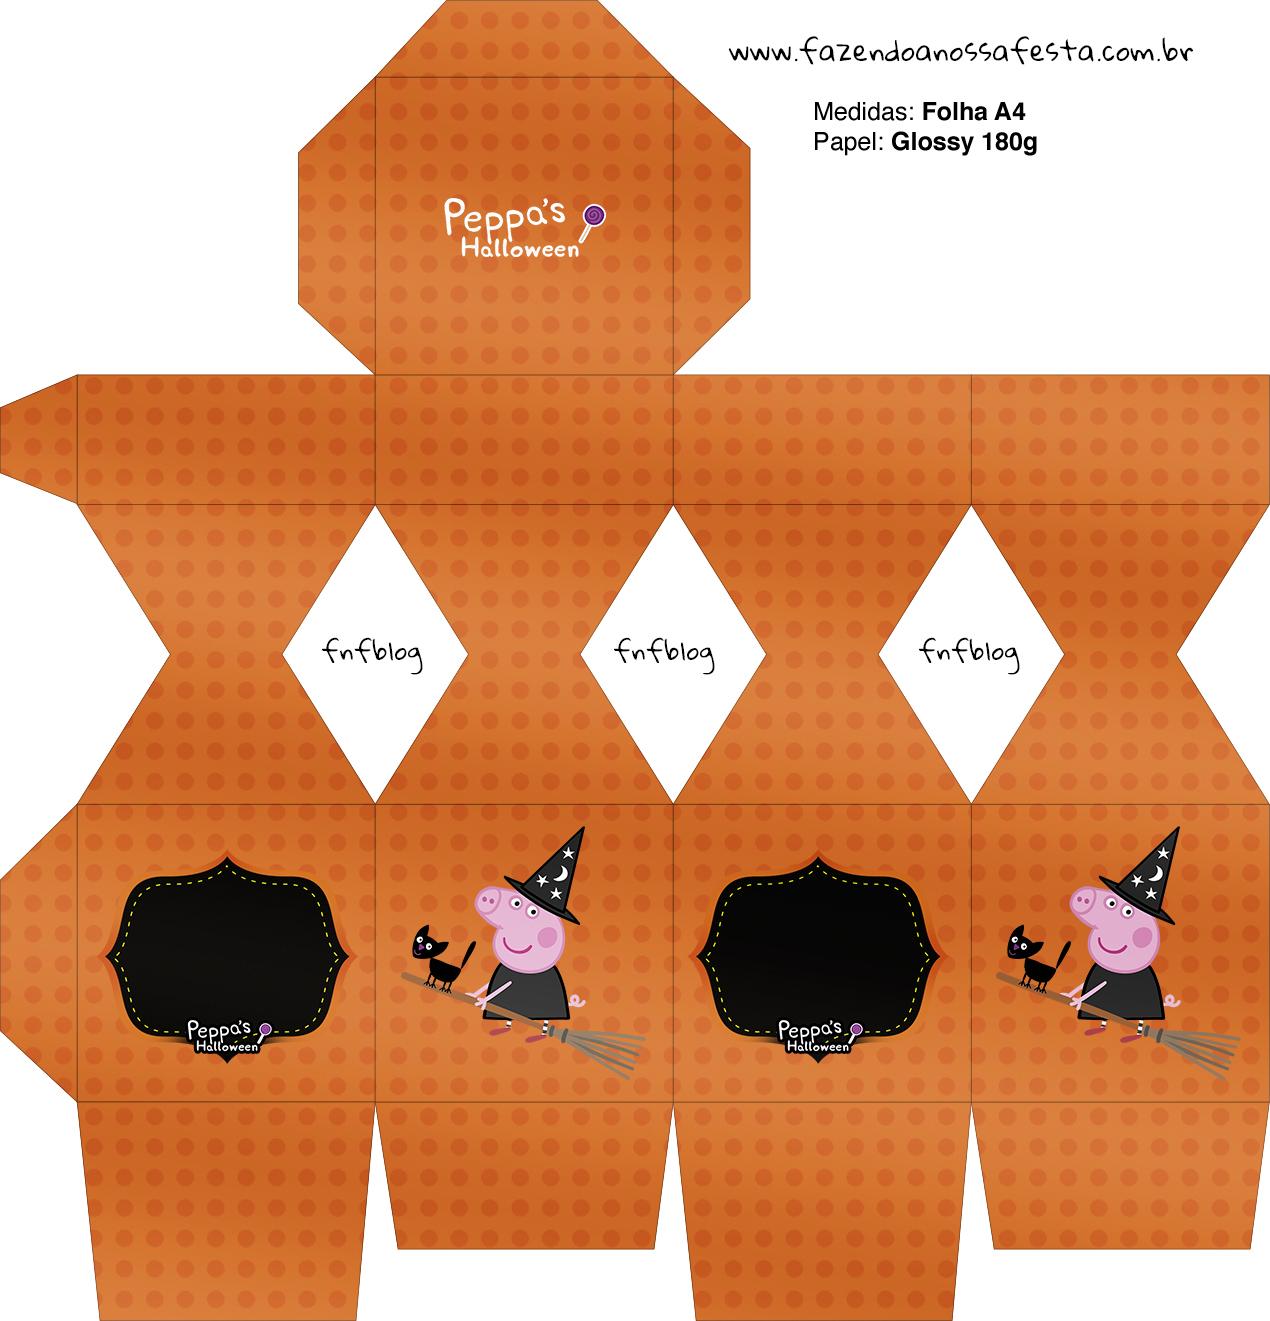 Meia Caixa Bala Peppa Pig Halloween